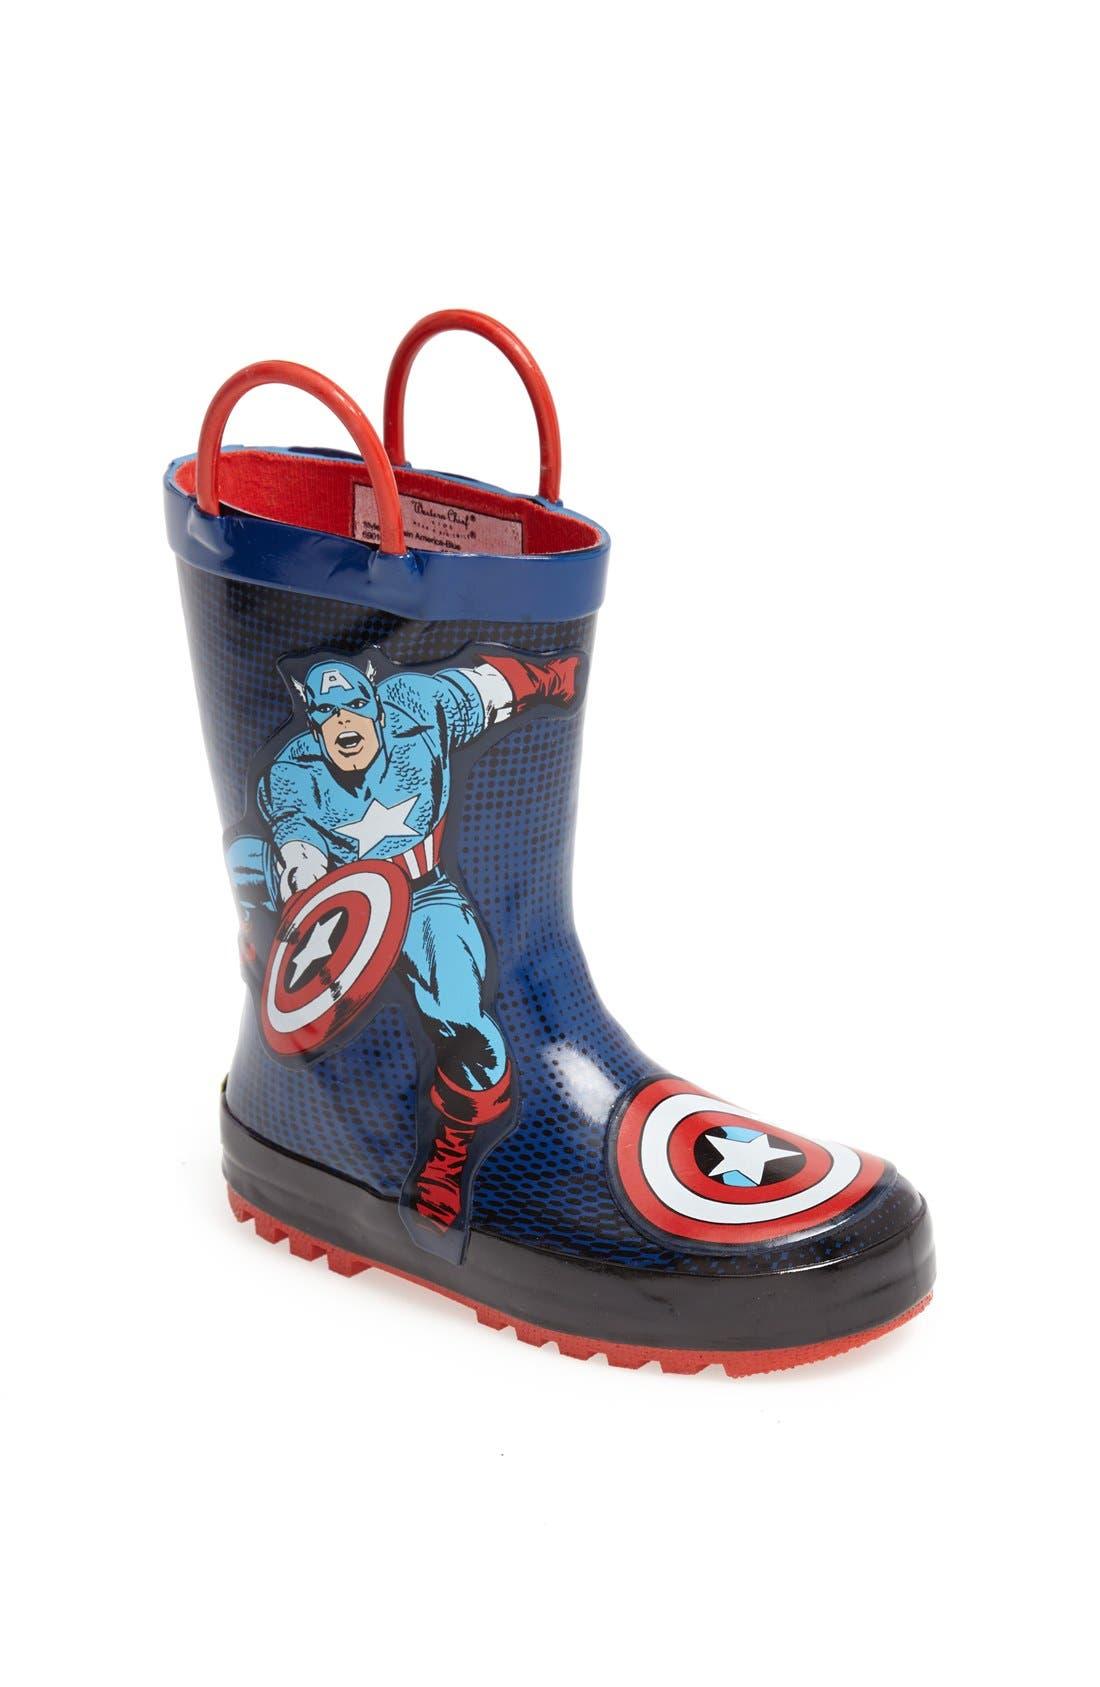 Alternate Image 1 Selected - Western Chief 'Captain America™' Rain Boot (Toddler)